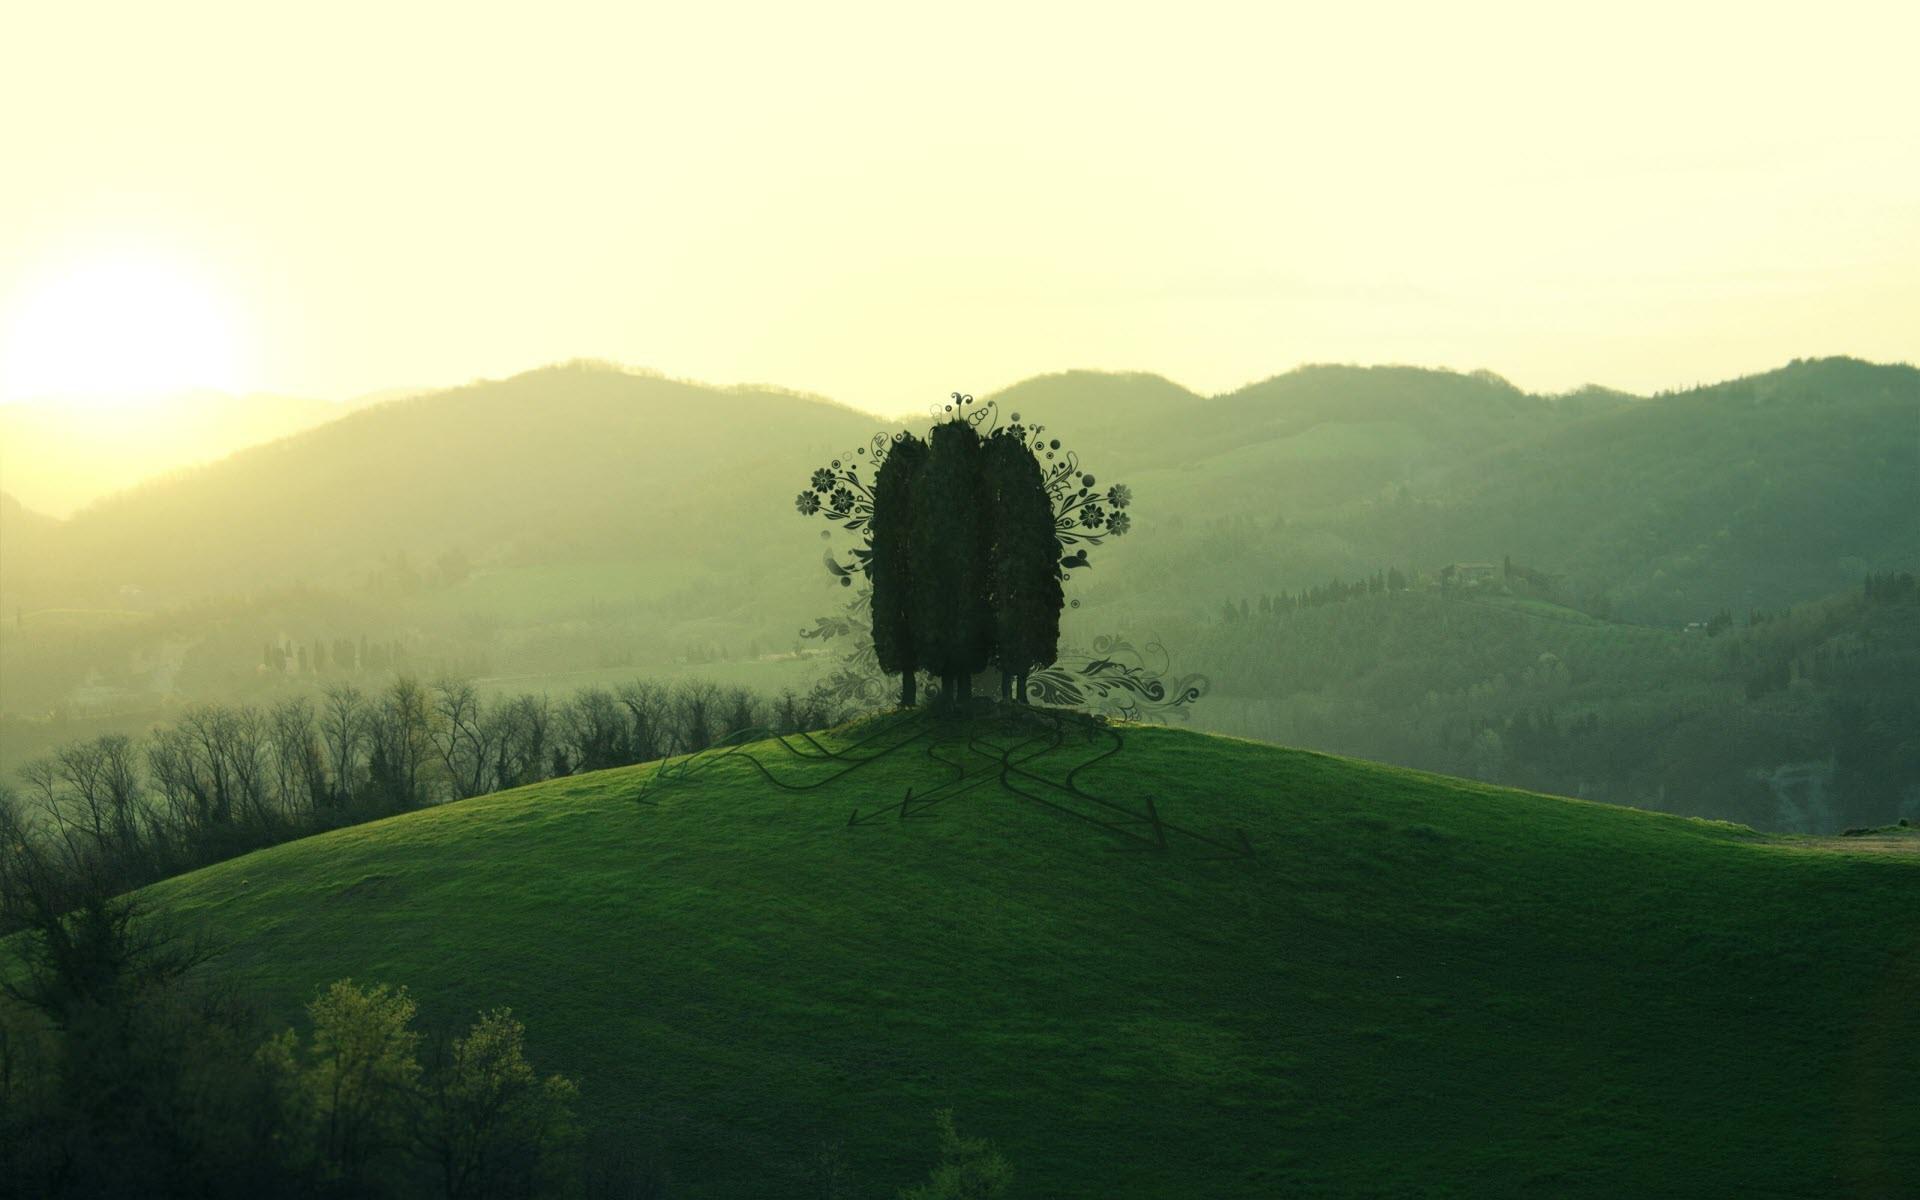 The Hill is Alive desktop wallpaper 1920x1200